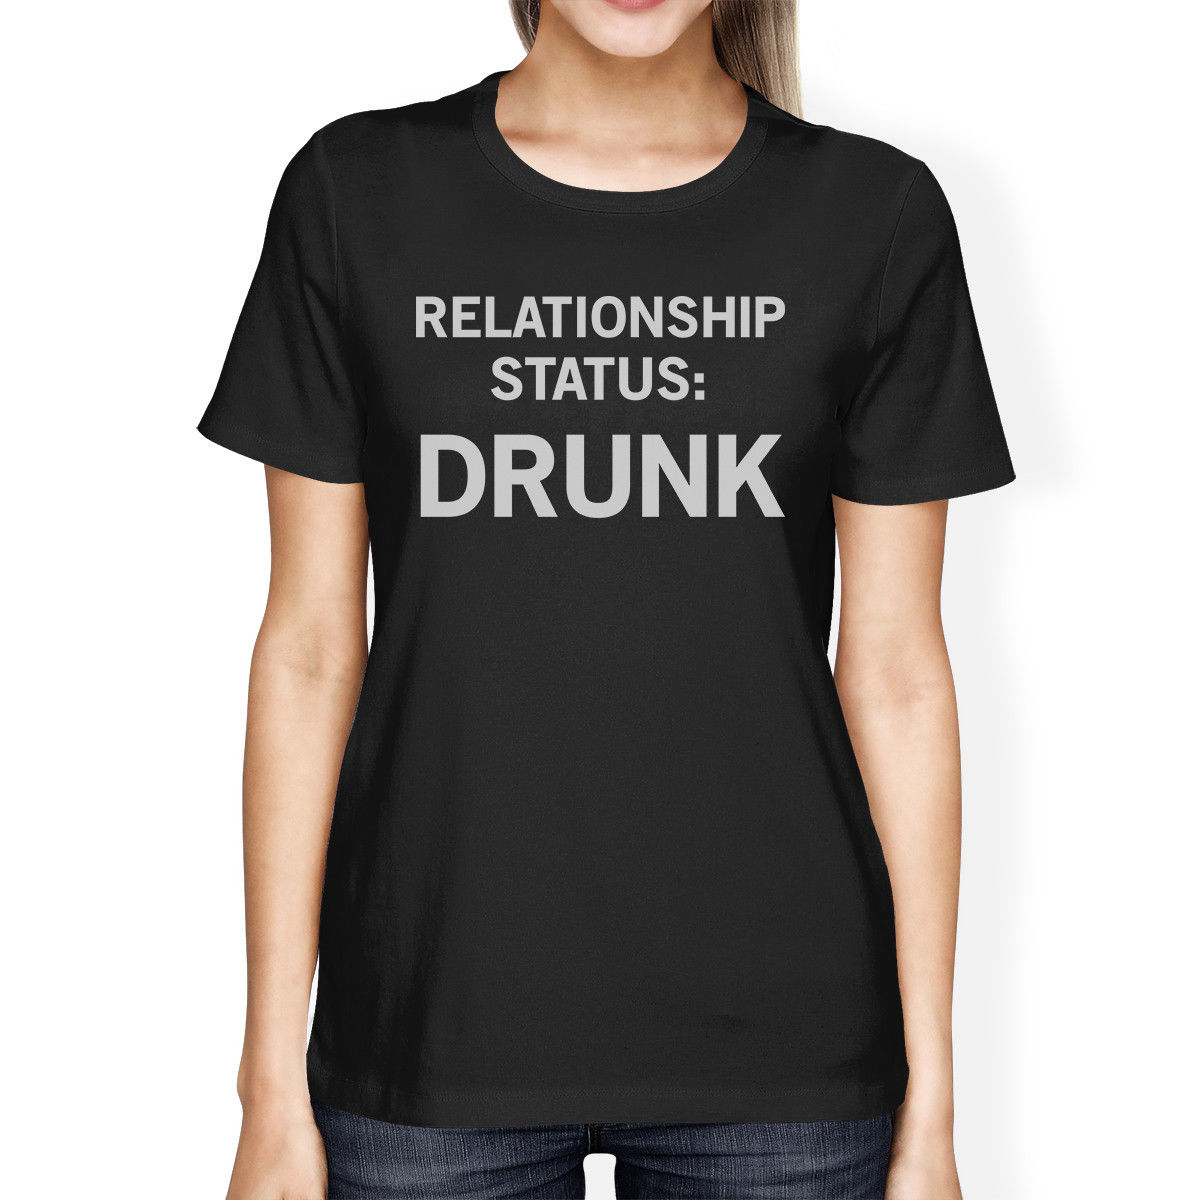 Desain t shirt unik - Status Hubungan Hitam Lengan Pendek T Shirt Unik Ide Hadiah Merek Fashion Harajuku Hipster Perempuan T